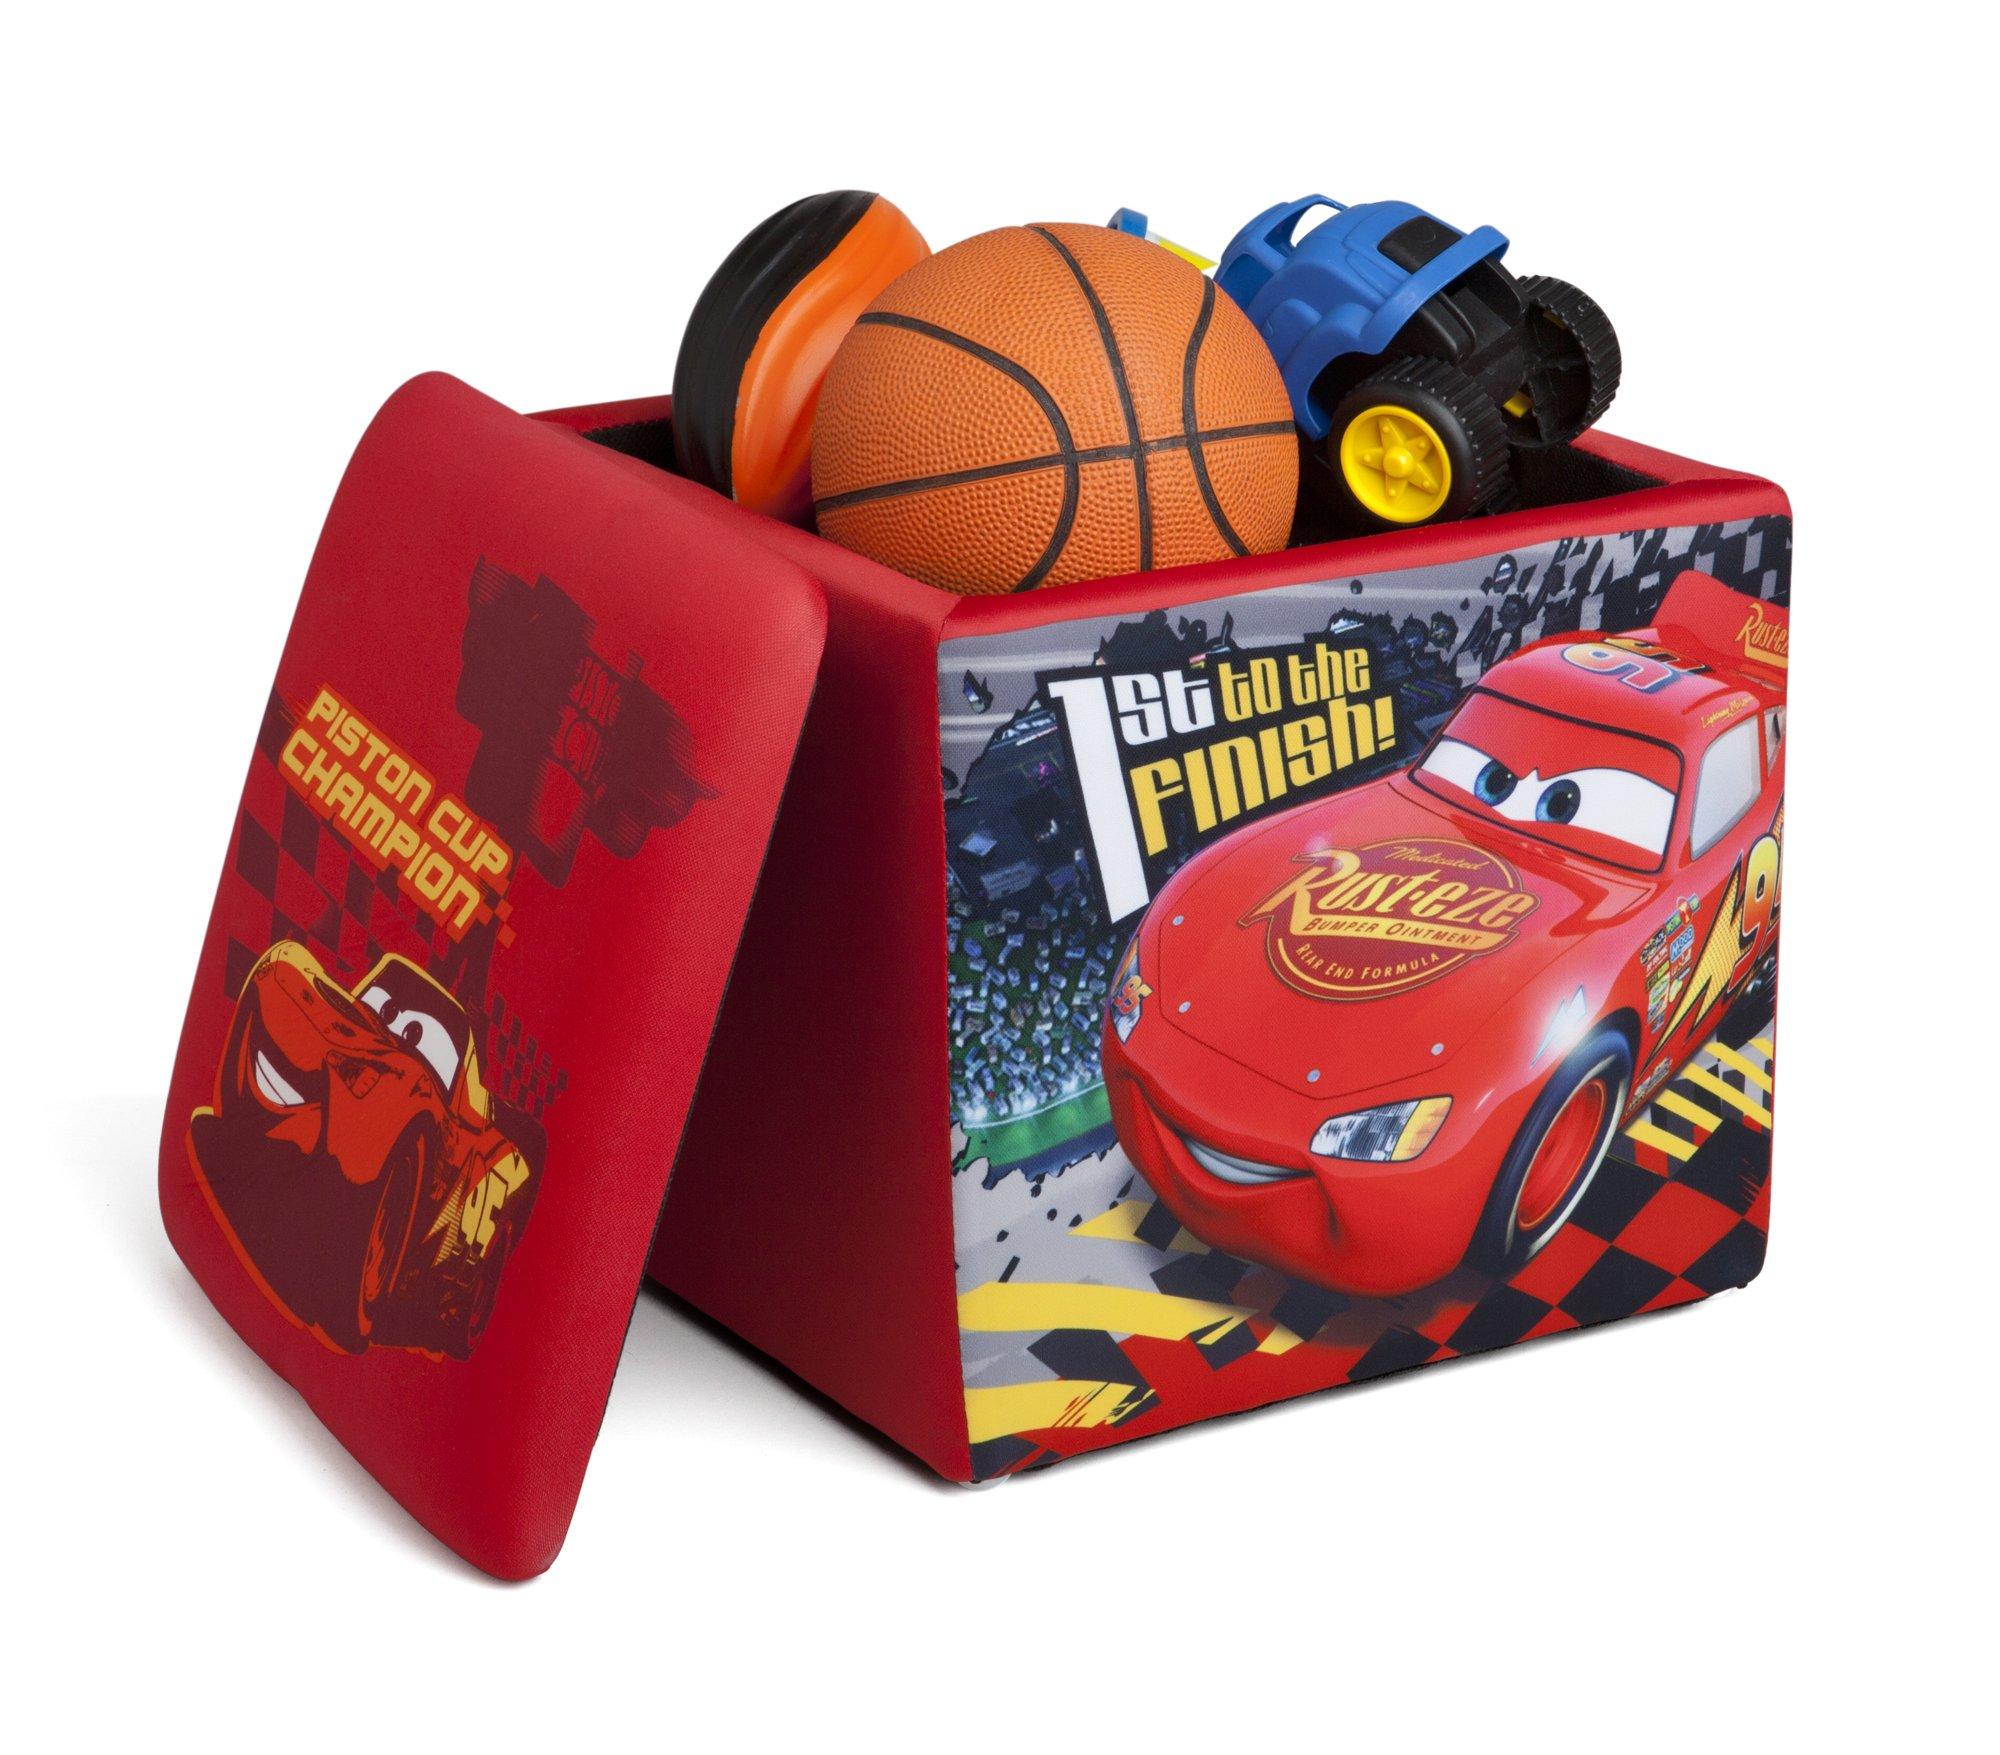 Disney Pixar Cars Lightning McQueen Storage Ottoman Seat